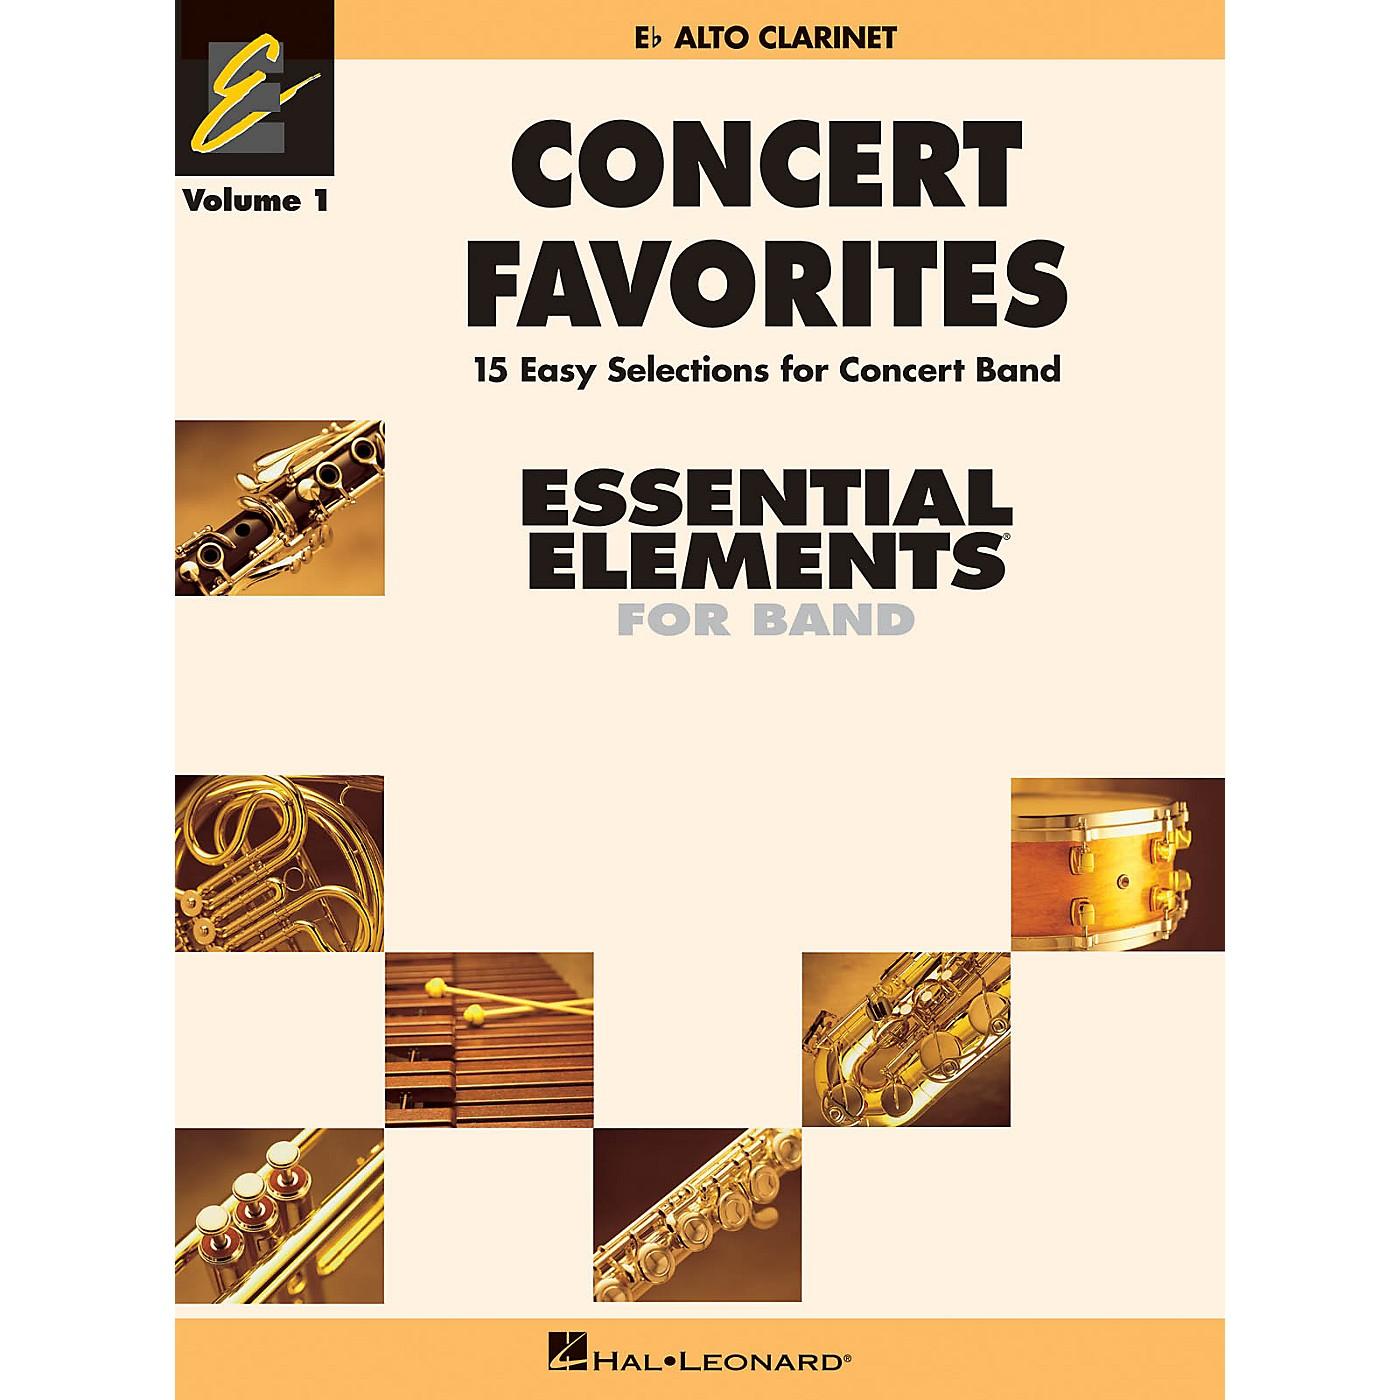 Hal Leonard Concert Favorites Vol. 1 - Eb Alto Clarinet Concert Band Level 1-1.5 Arranged by Michael Sweeney thumbnail